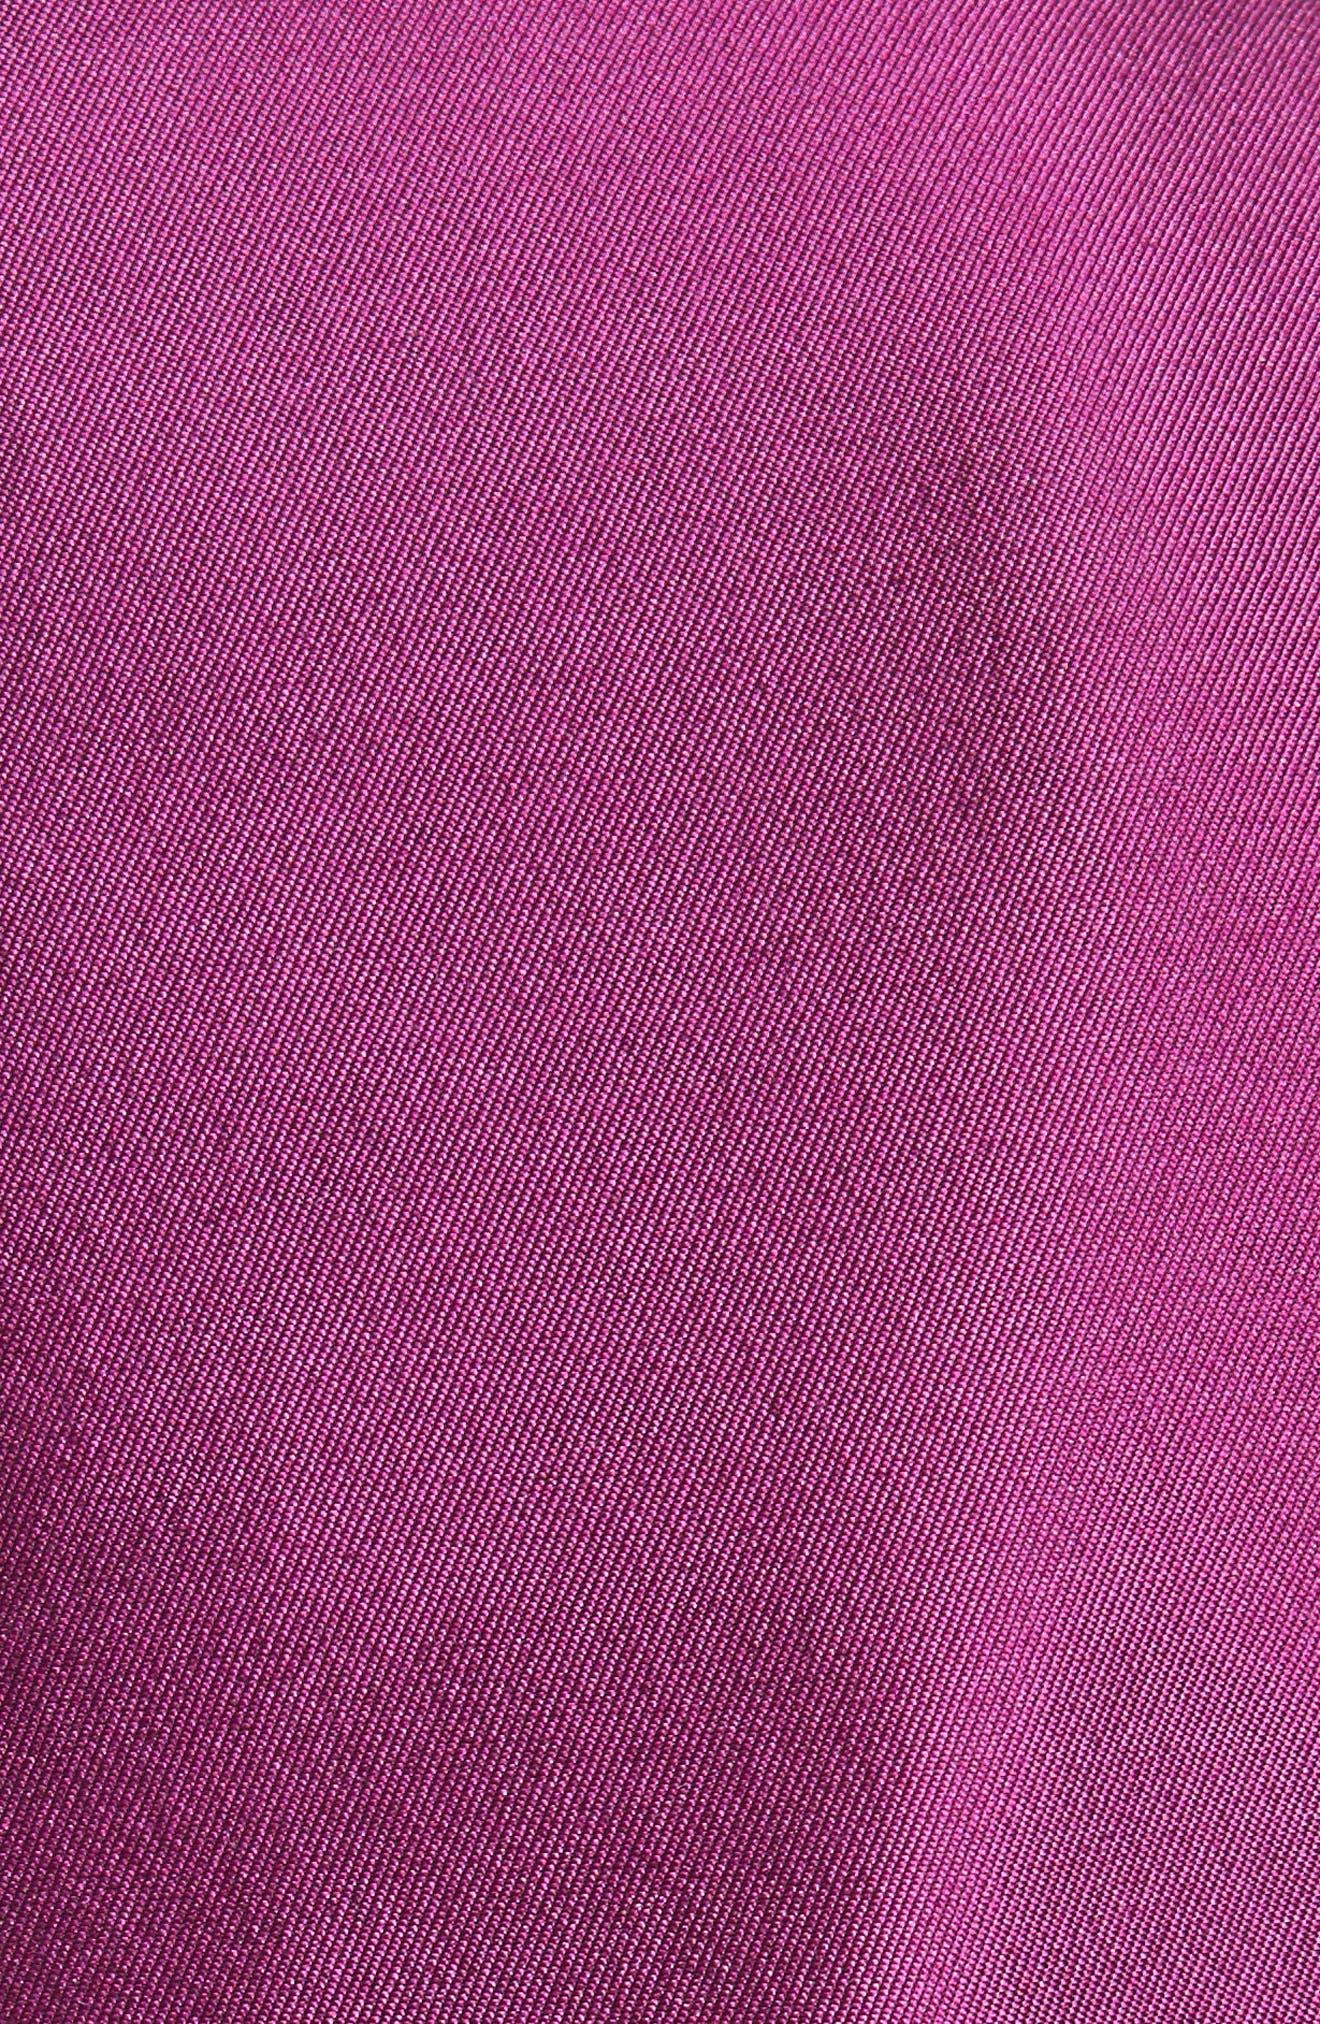 Fit & Flare Faille Dress,                             Alternate thumbnail 5, color,